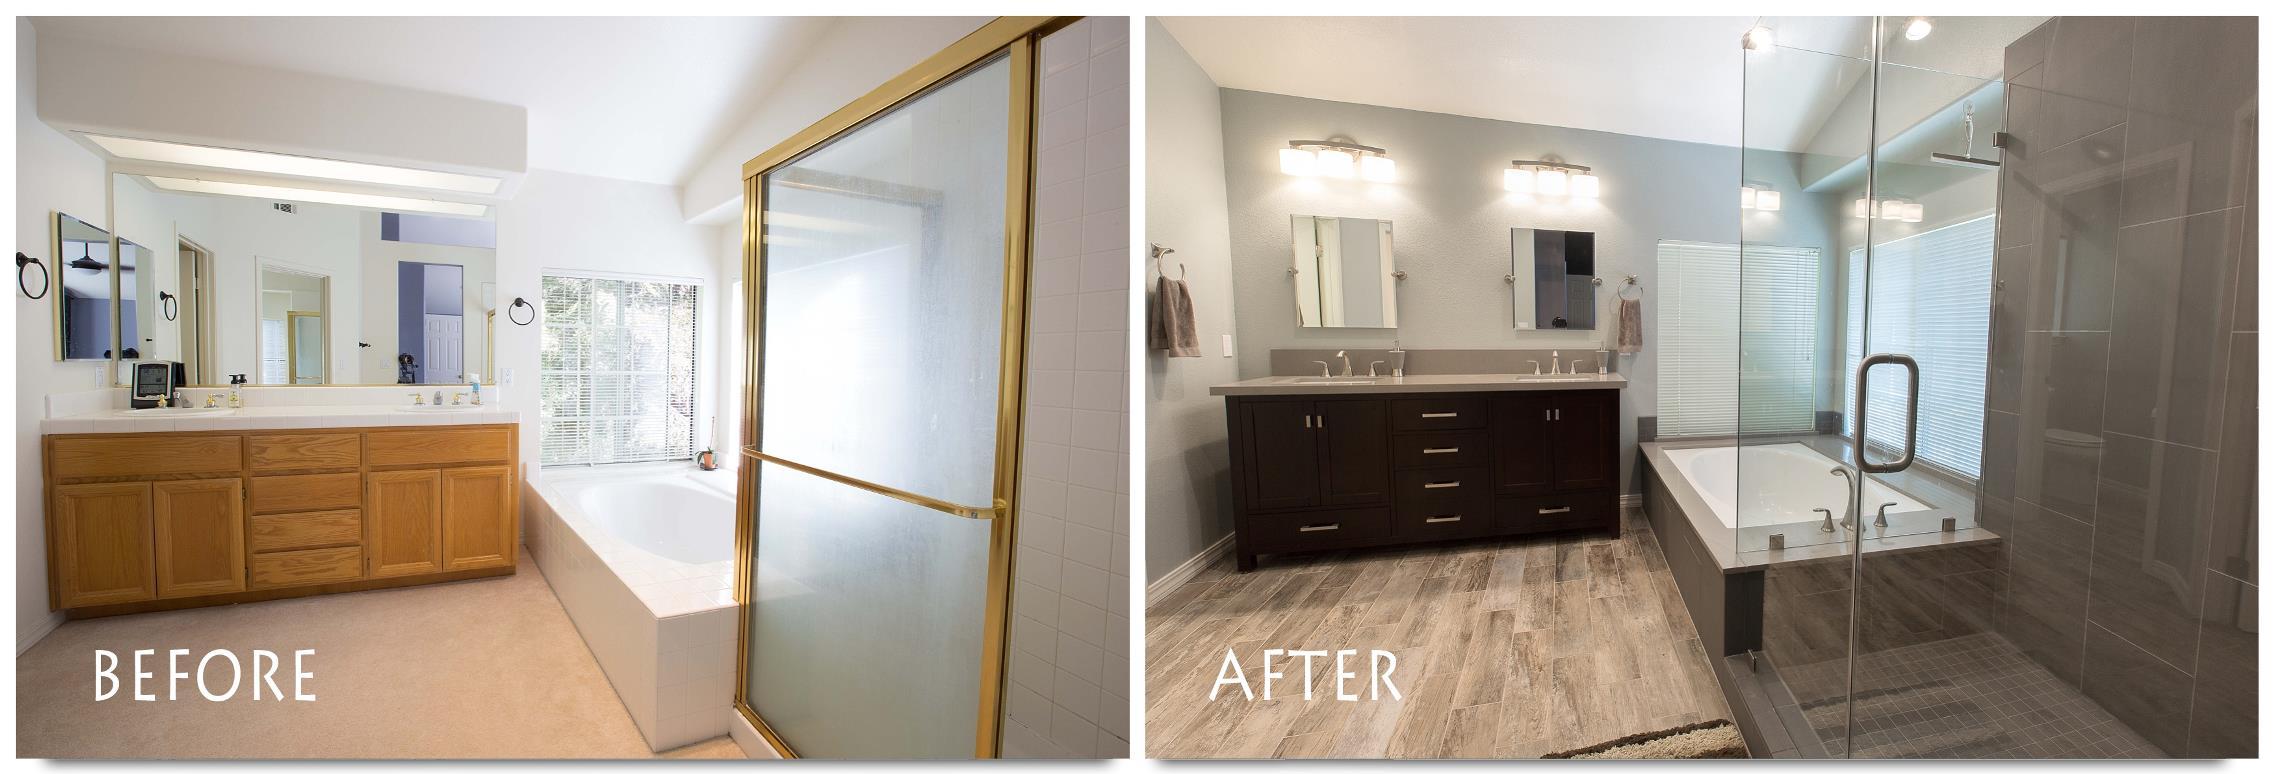 modern see through bathroom remodeling ideas | lovelyspaces.com